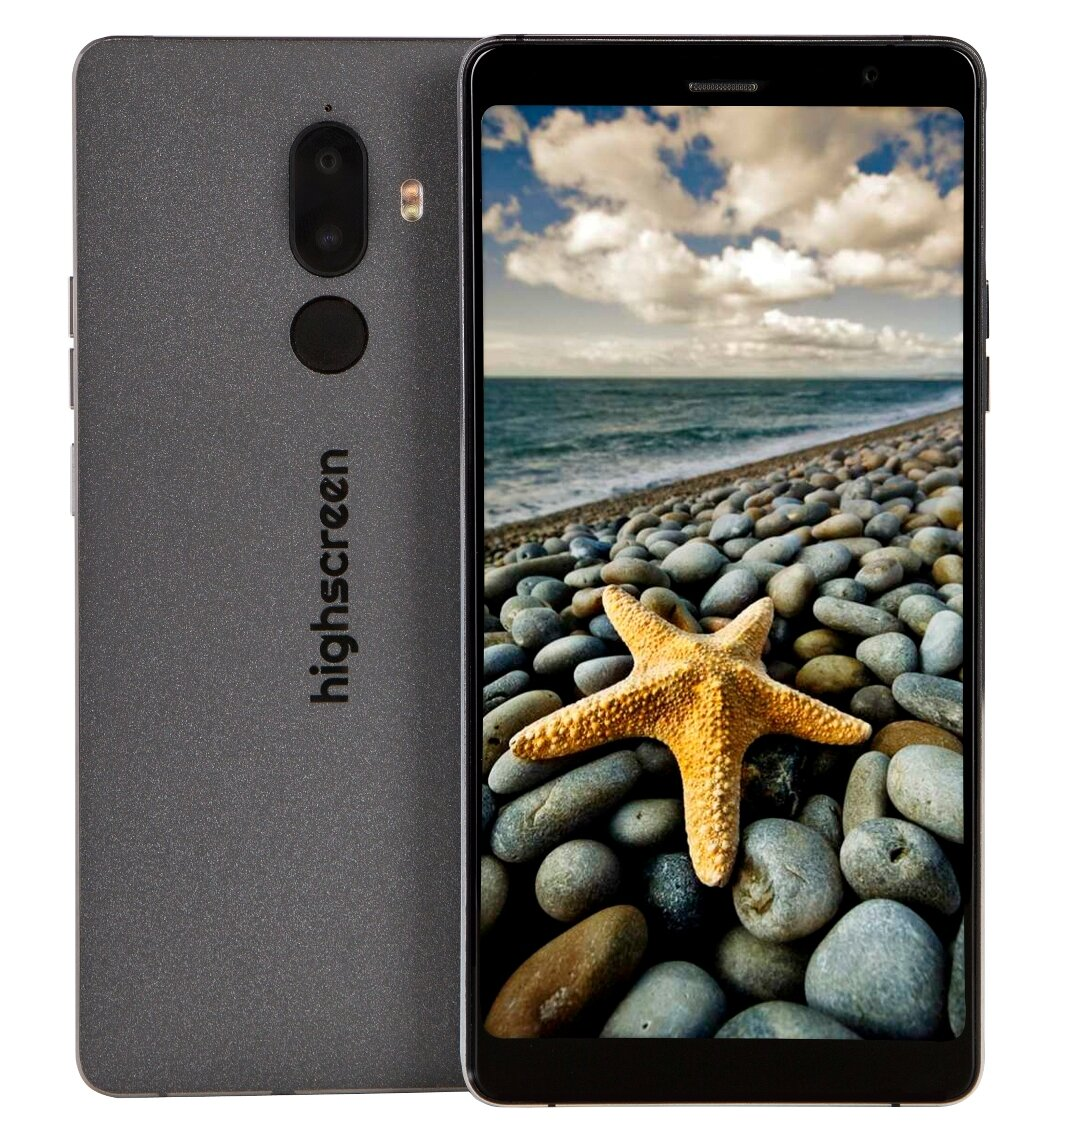 Мобильный телефон Смартфон Highscreen Power Five Max 2 3/32GB black